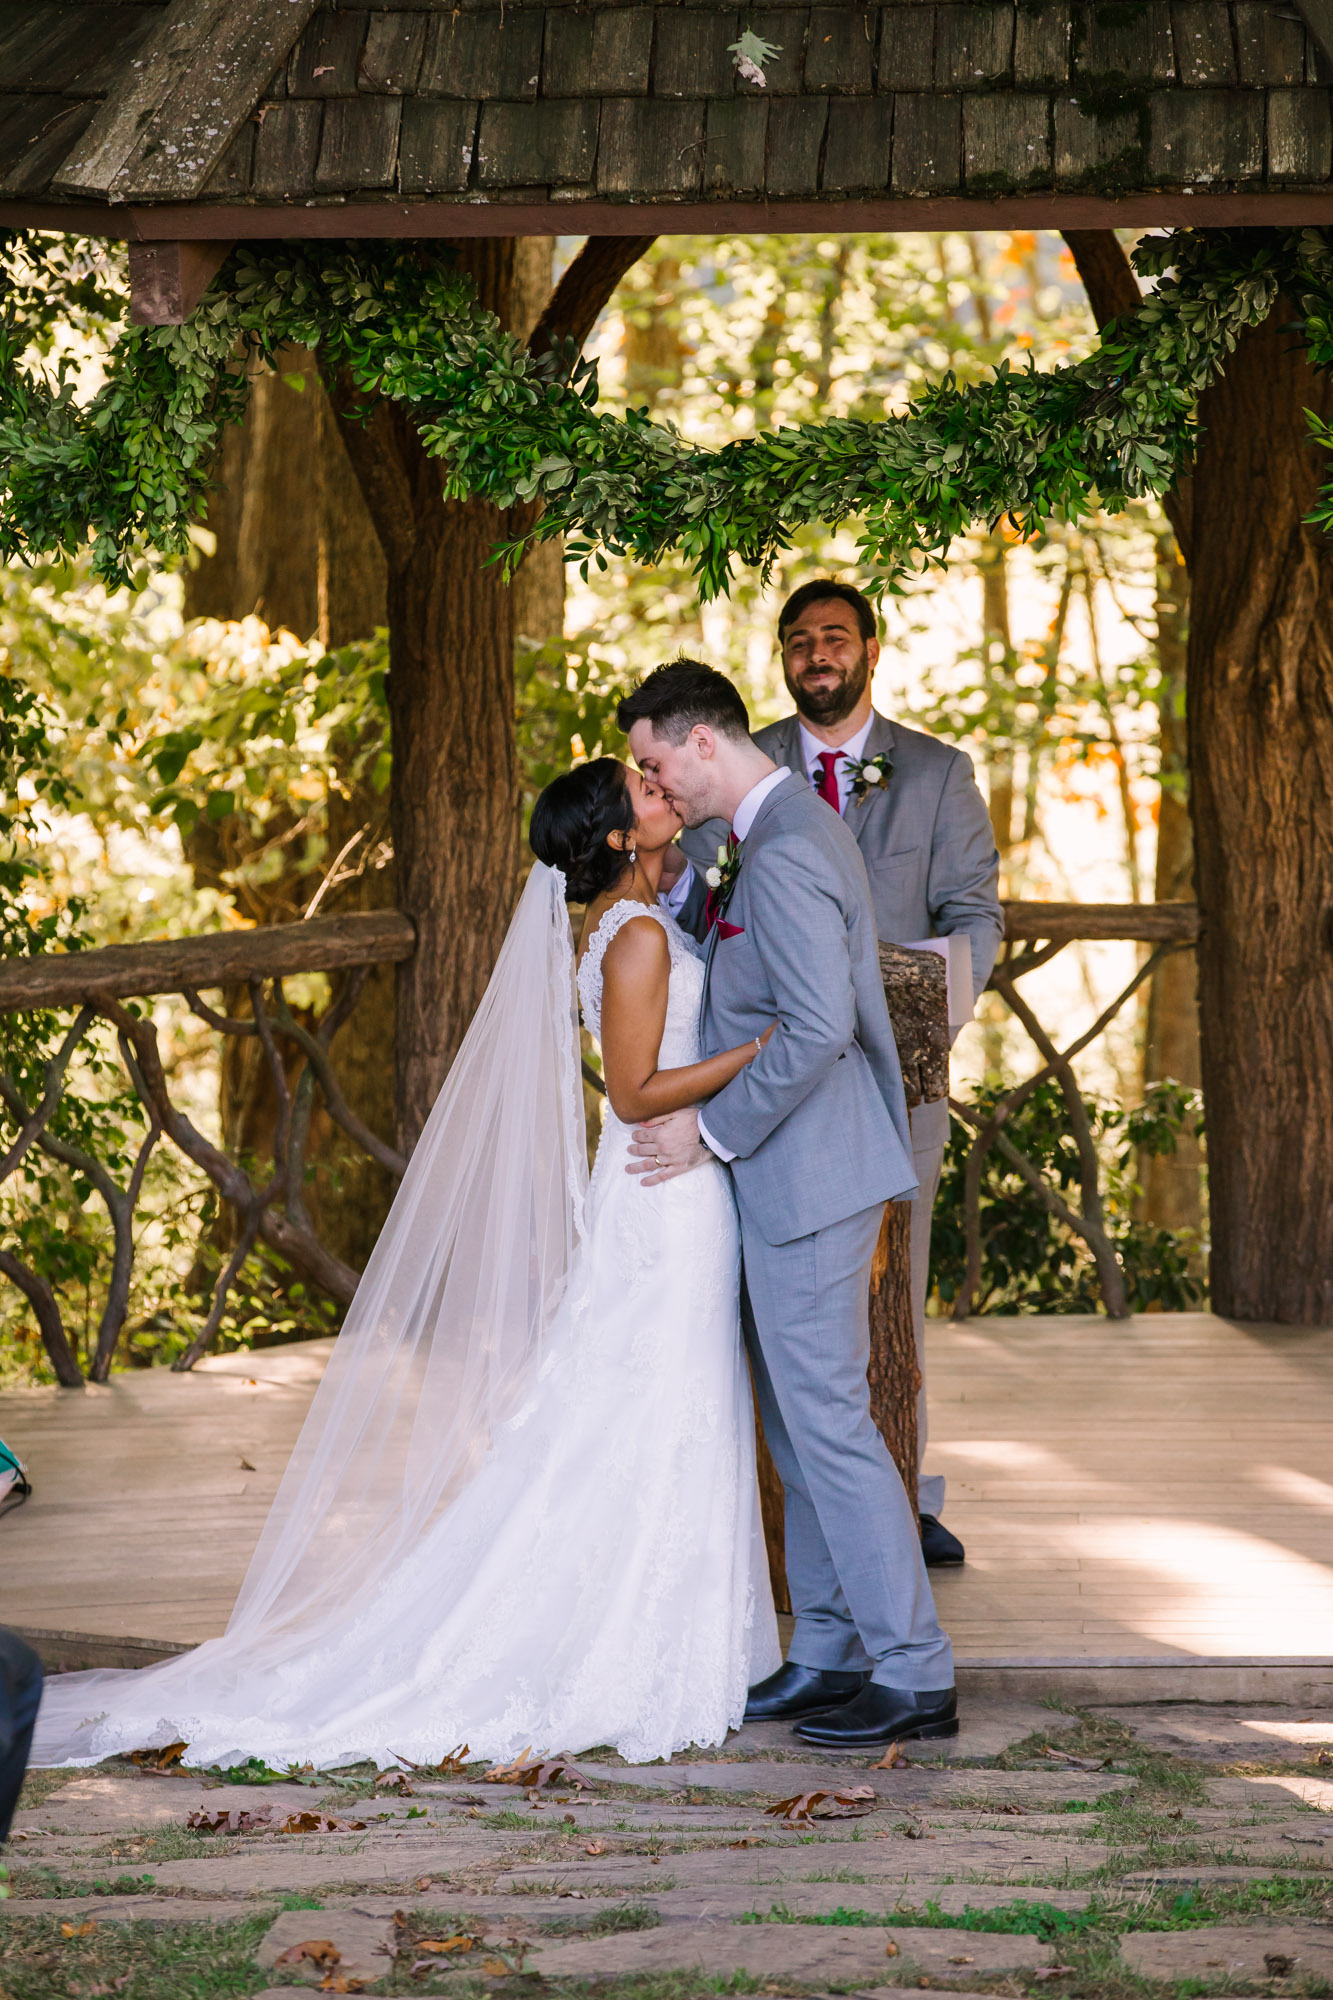 Waynesville NC Wedding Photography | Wedding Ceremony Kiss